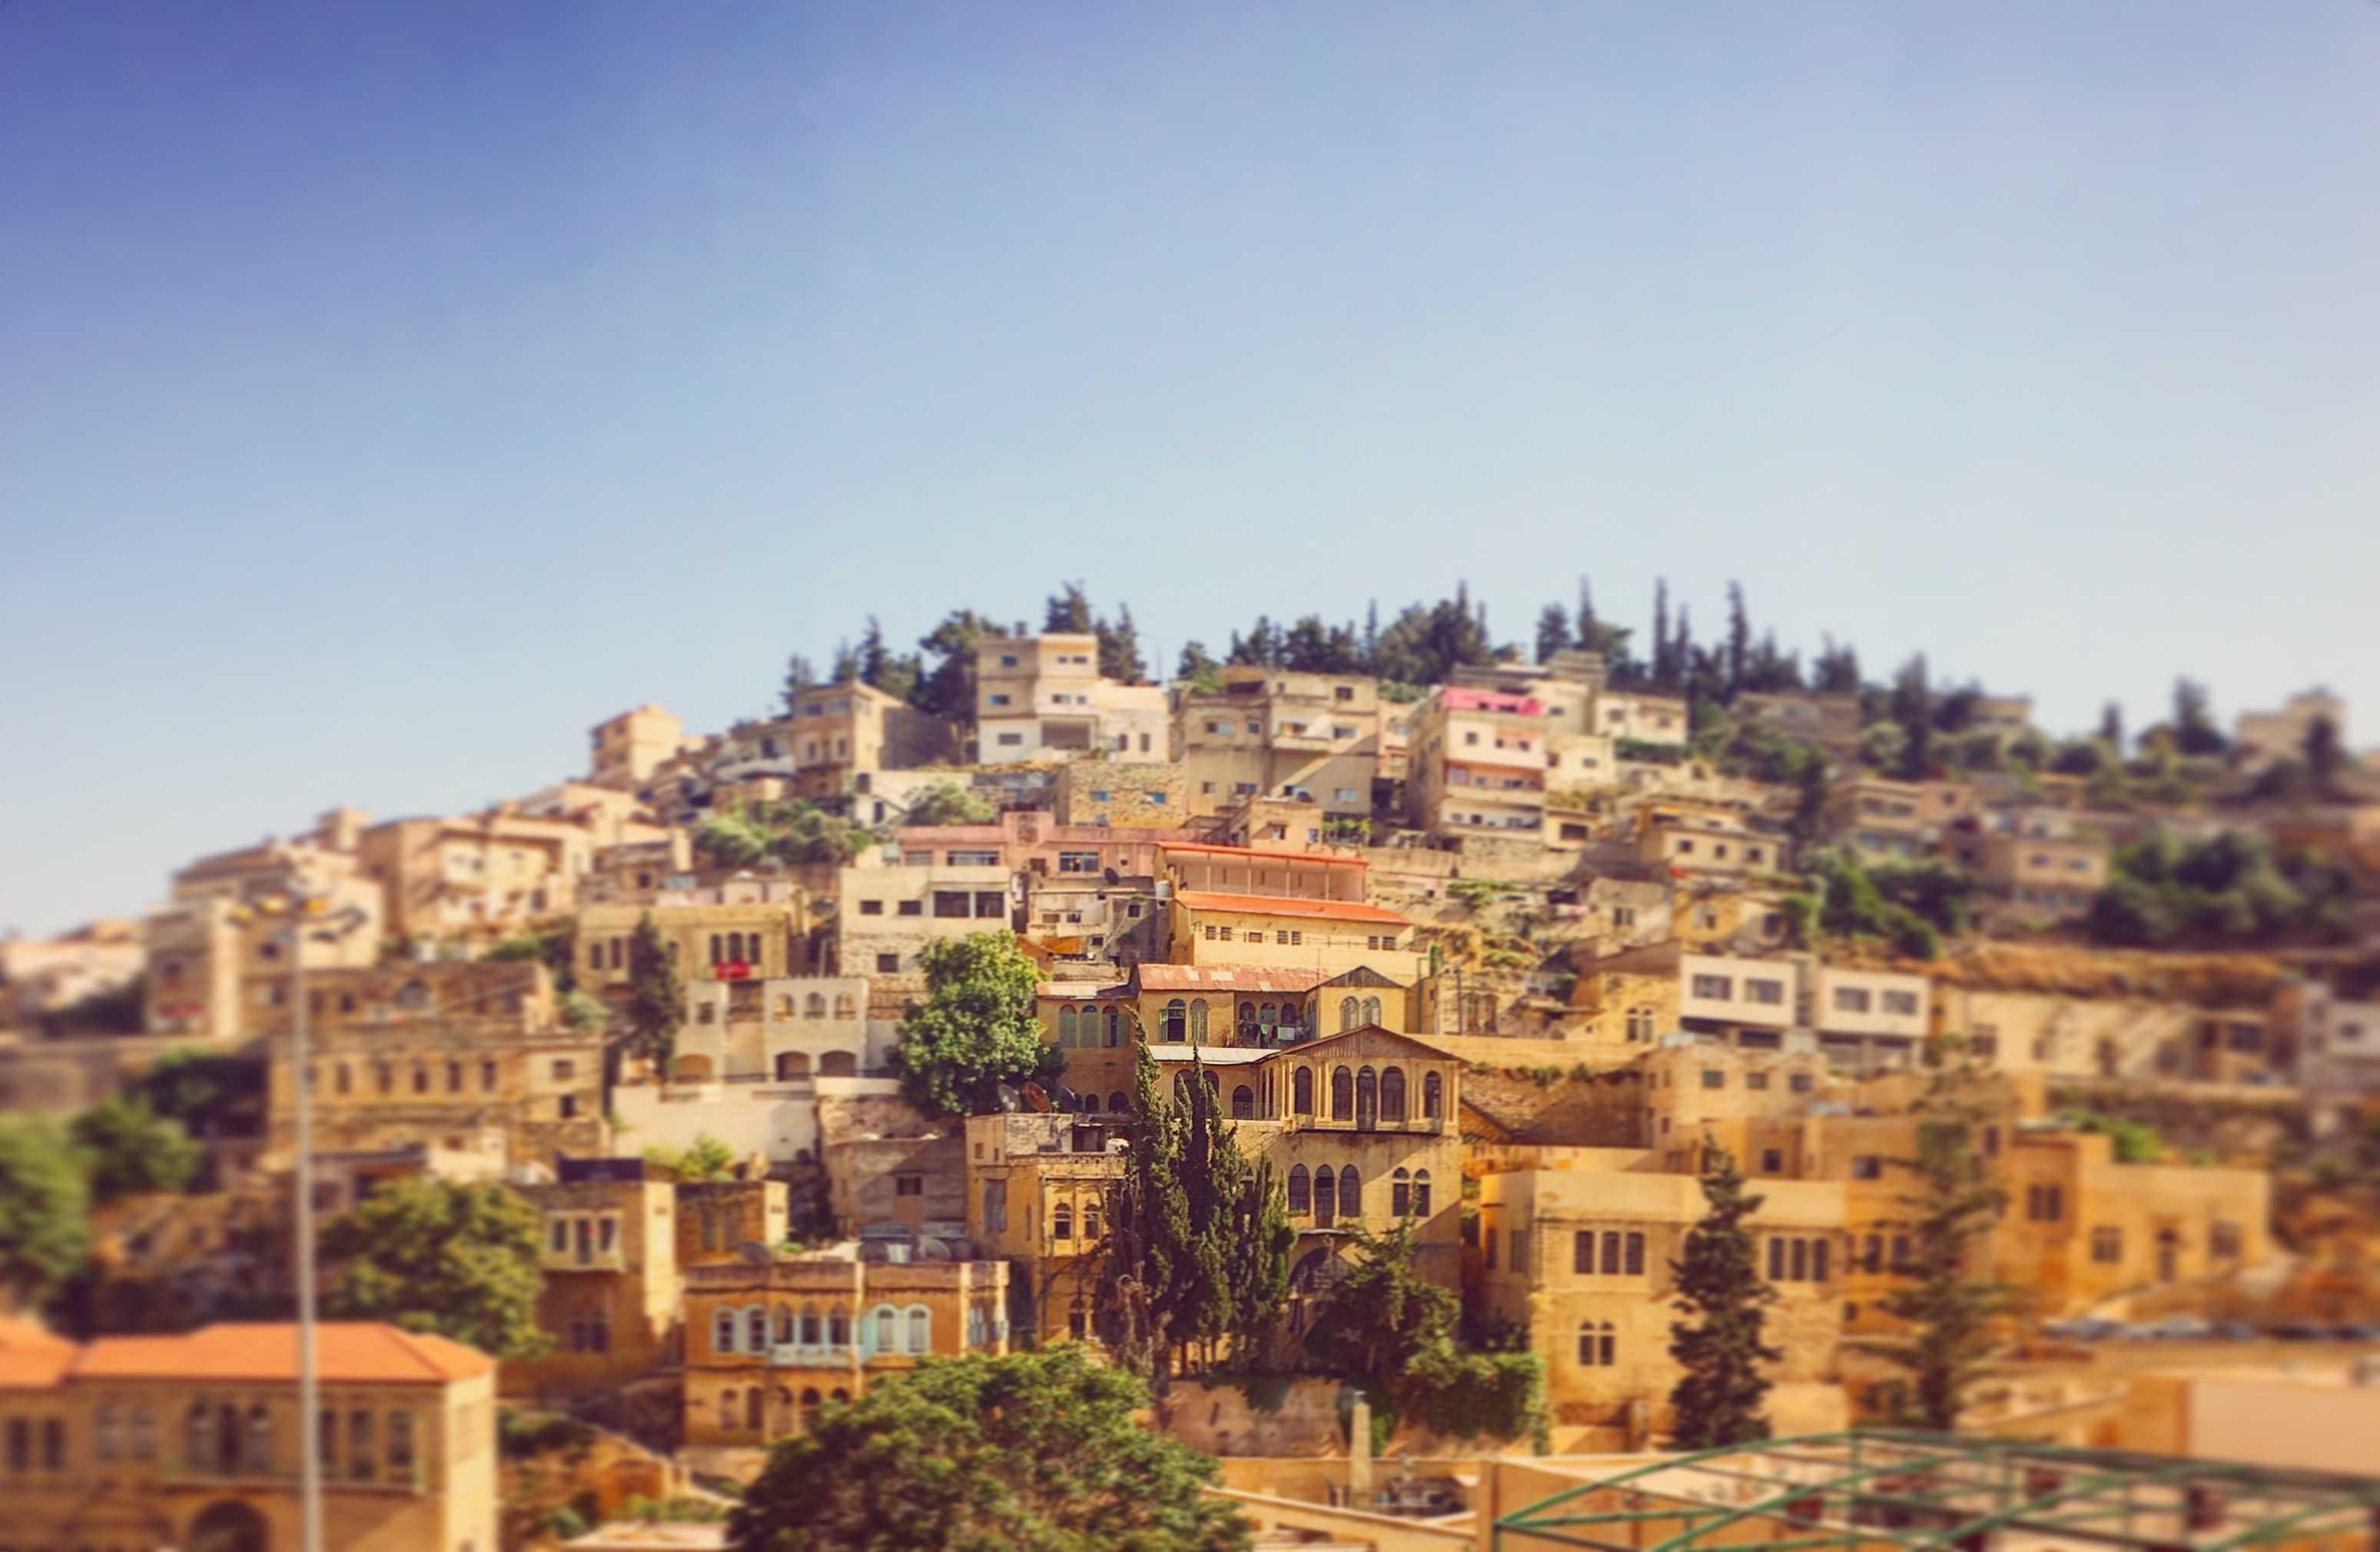 The city of As-Salt السالط